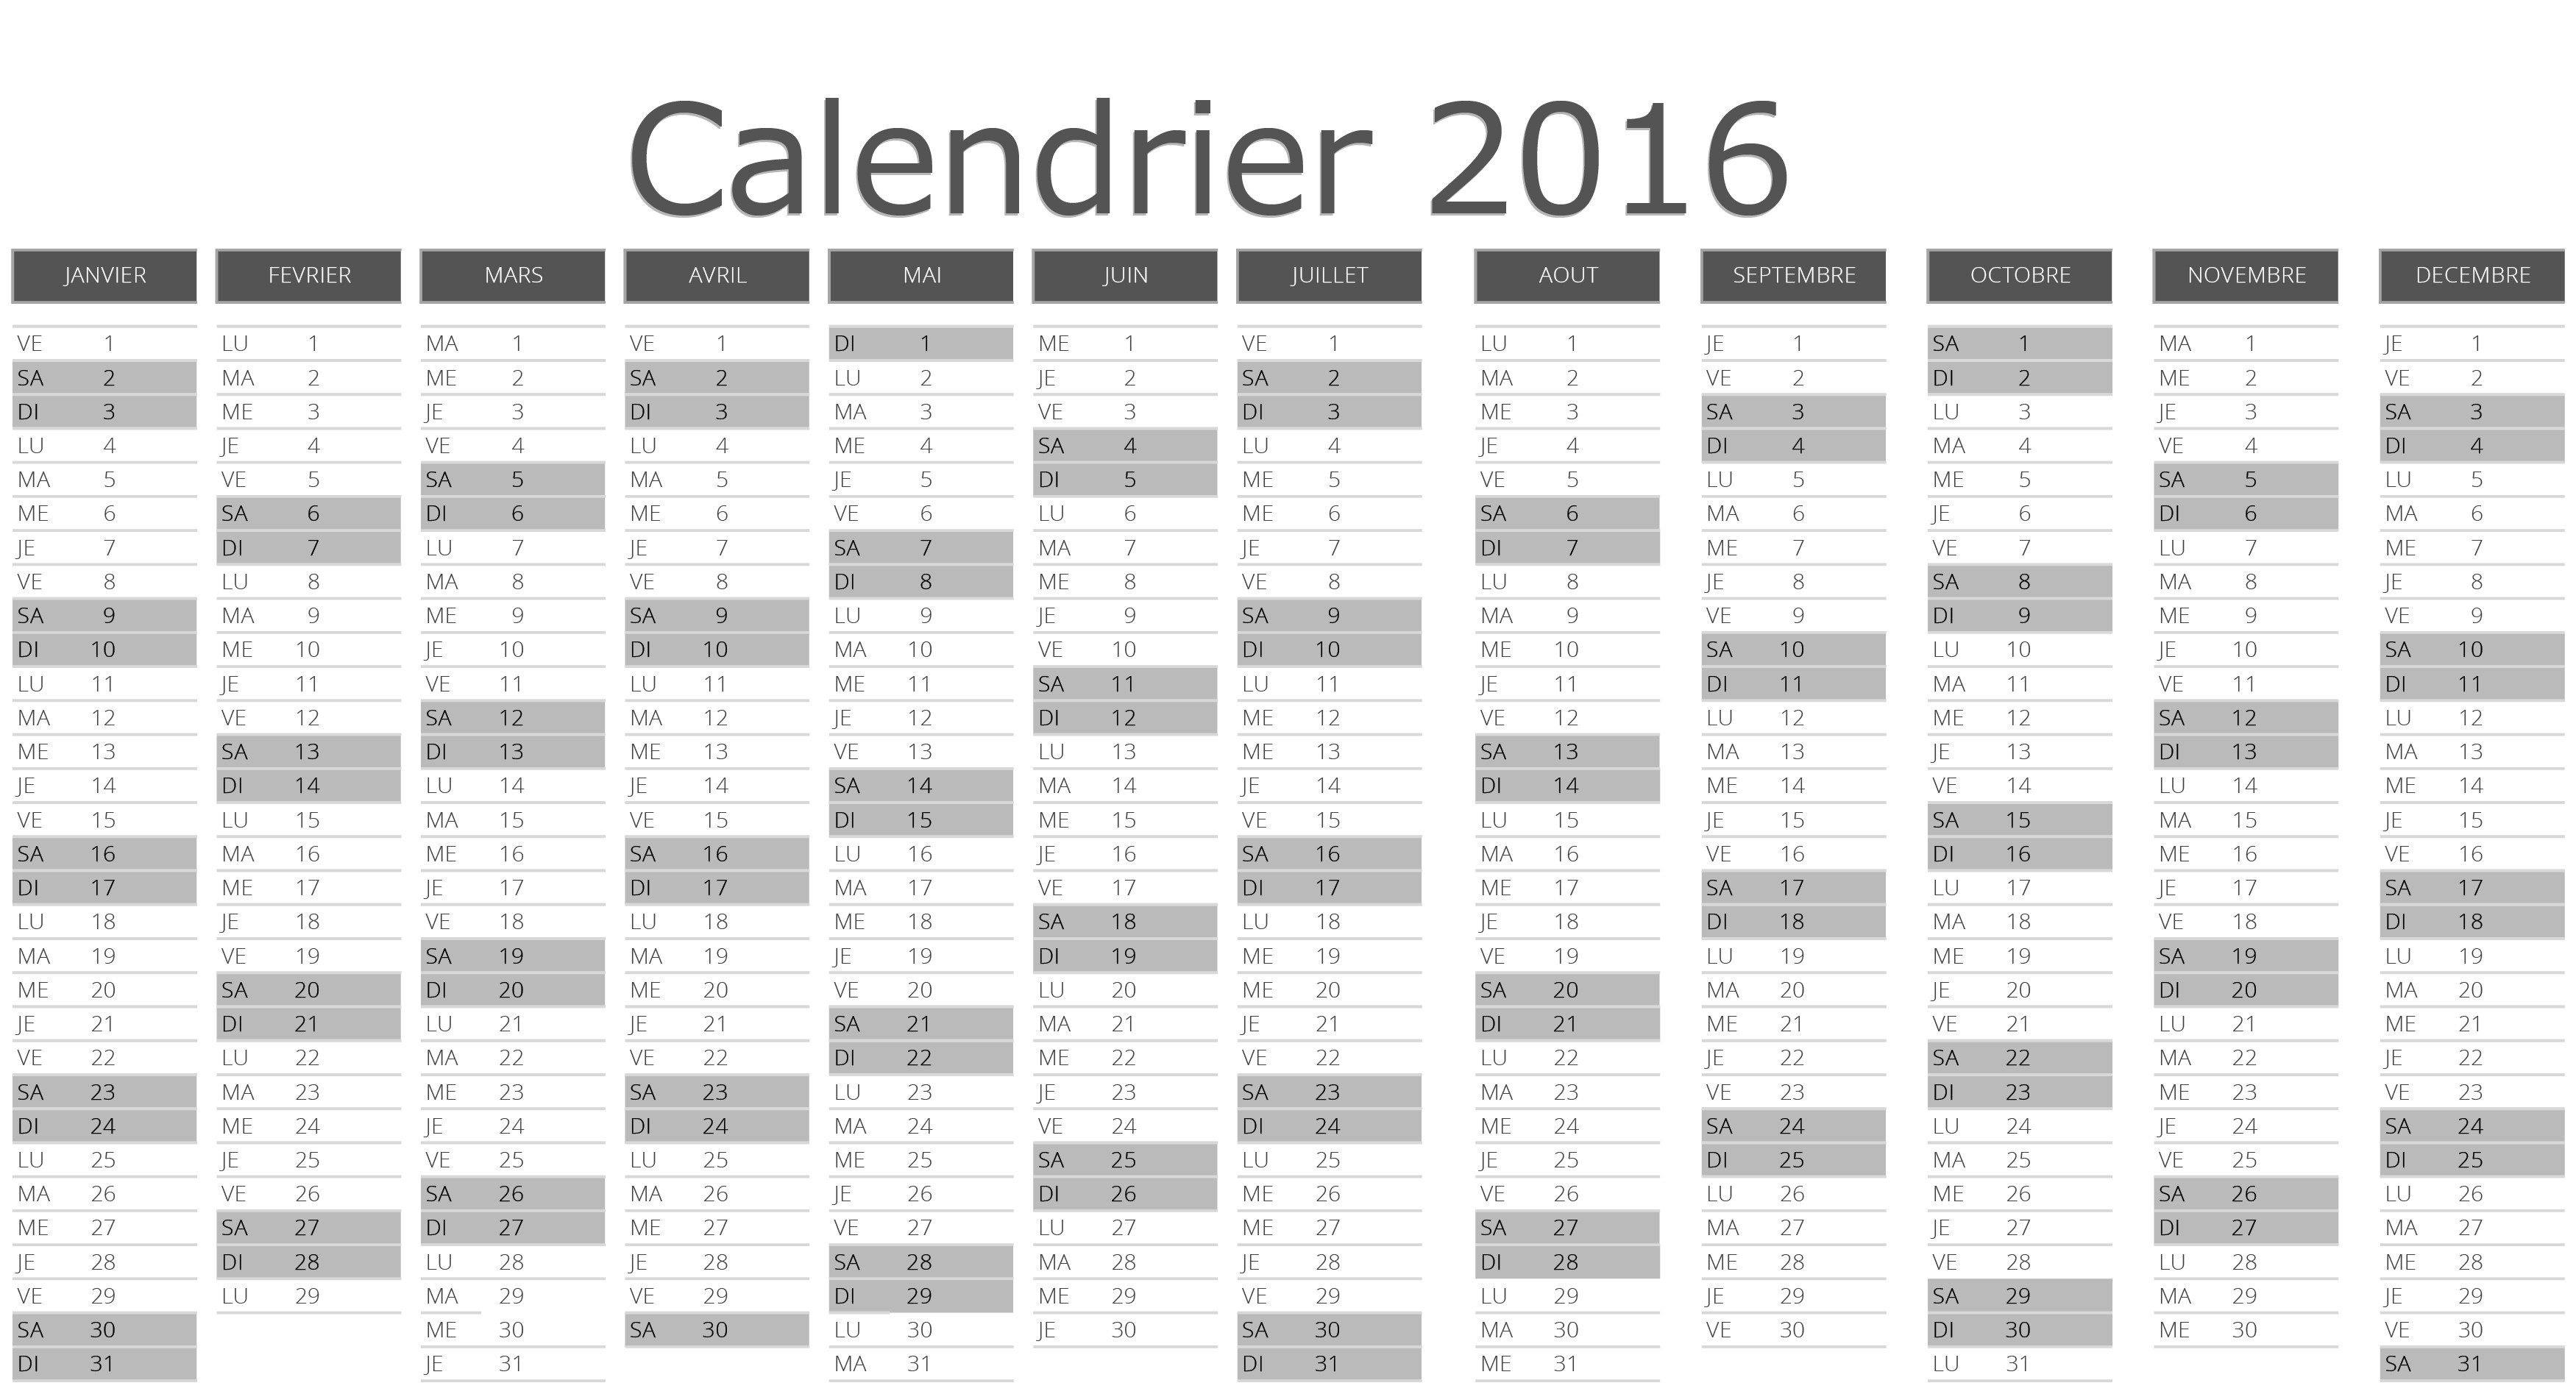 Calendario 2019 Chile Imprimir Con Feriados Más Populares 2019 2018 Calendar Printable with Holidays List Kalender Kalendar Of Calendario 2019 Chile Imprimir Con Feriados Más Recientemente Liberado Calendario 10 Octubre ☼ Calendario 2016 ☺